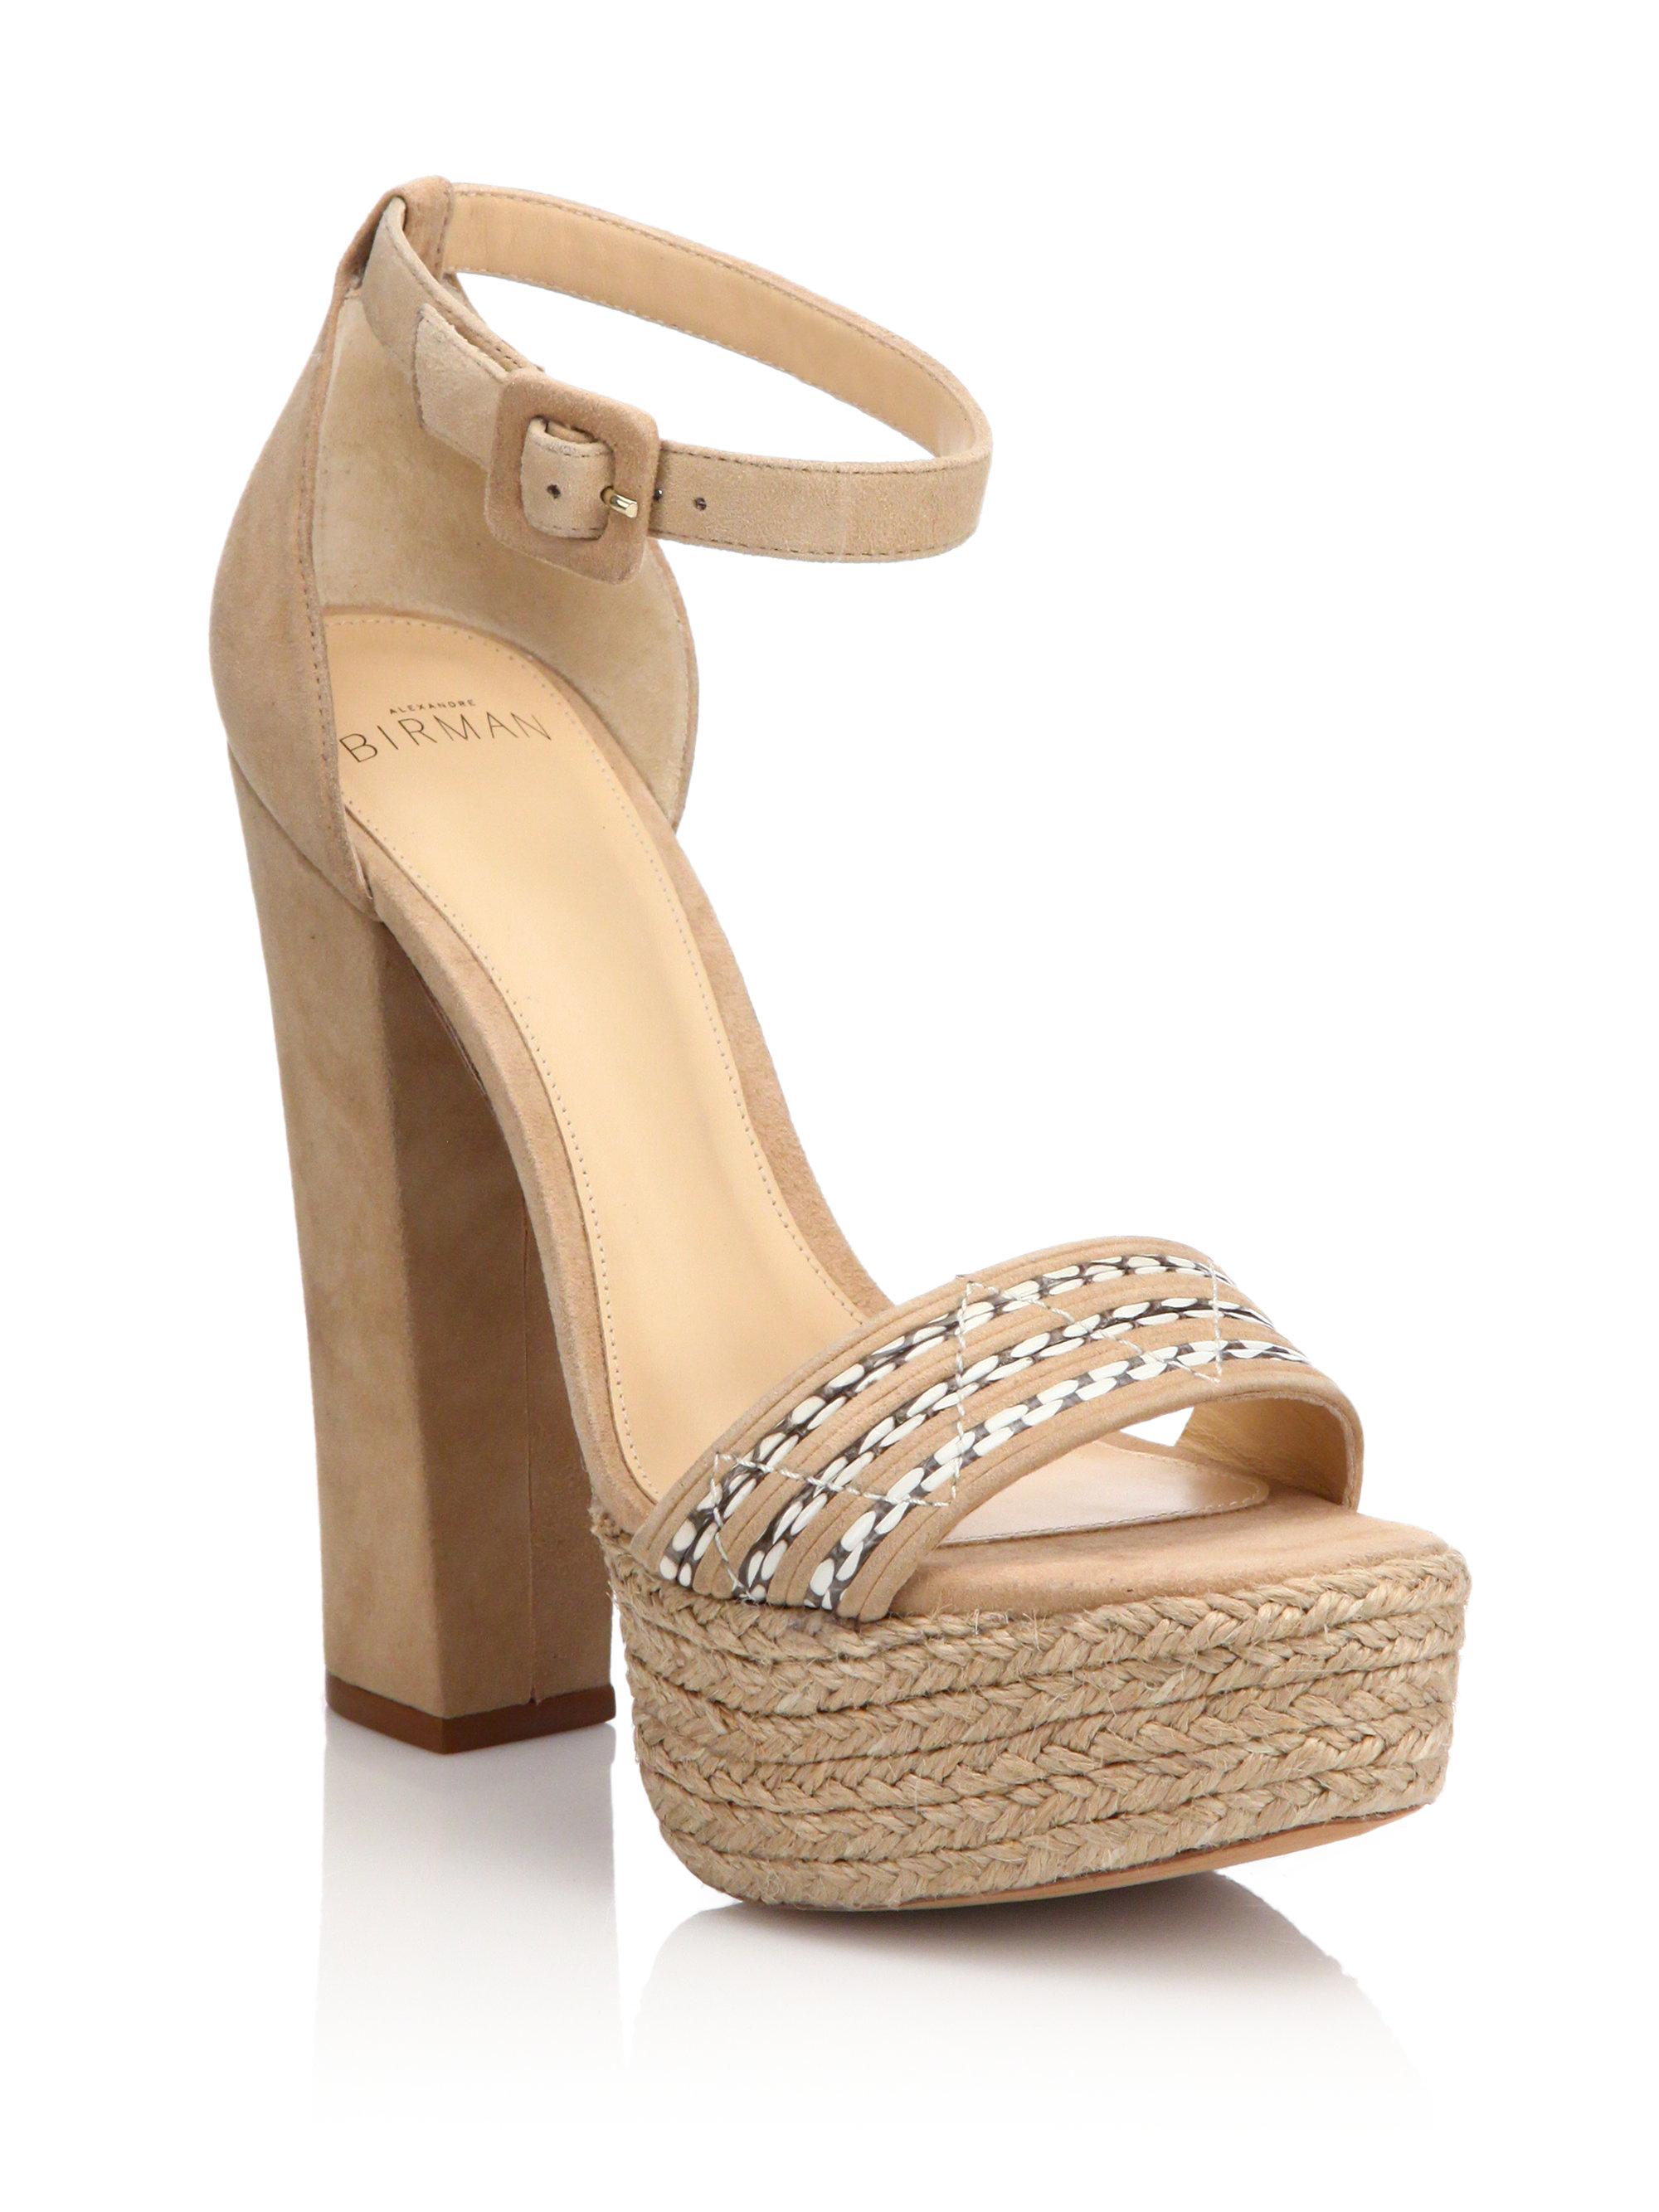 woven detail sandals - Black Alexandre Birman iQEBc2